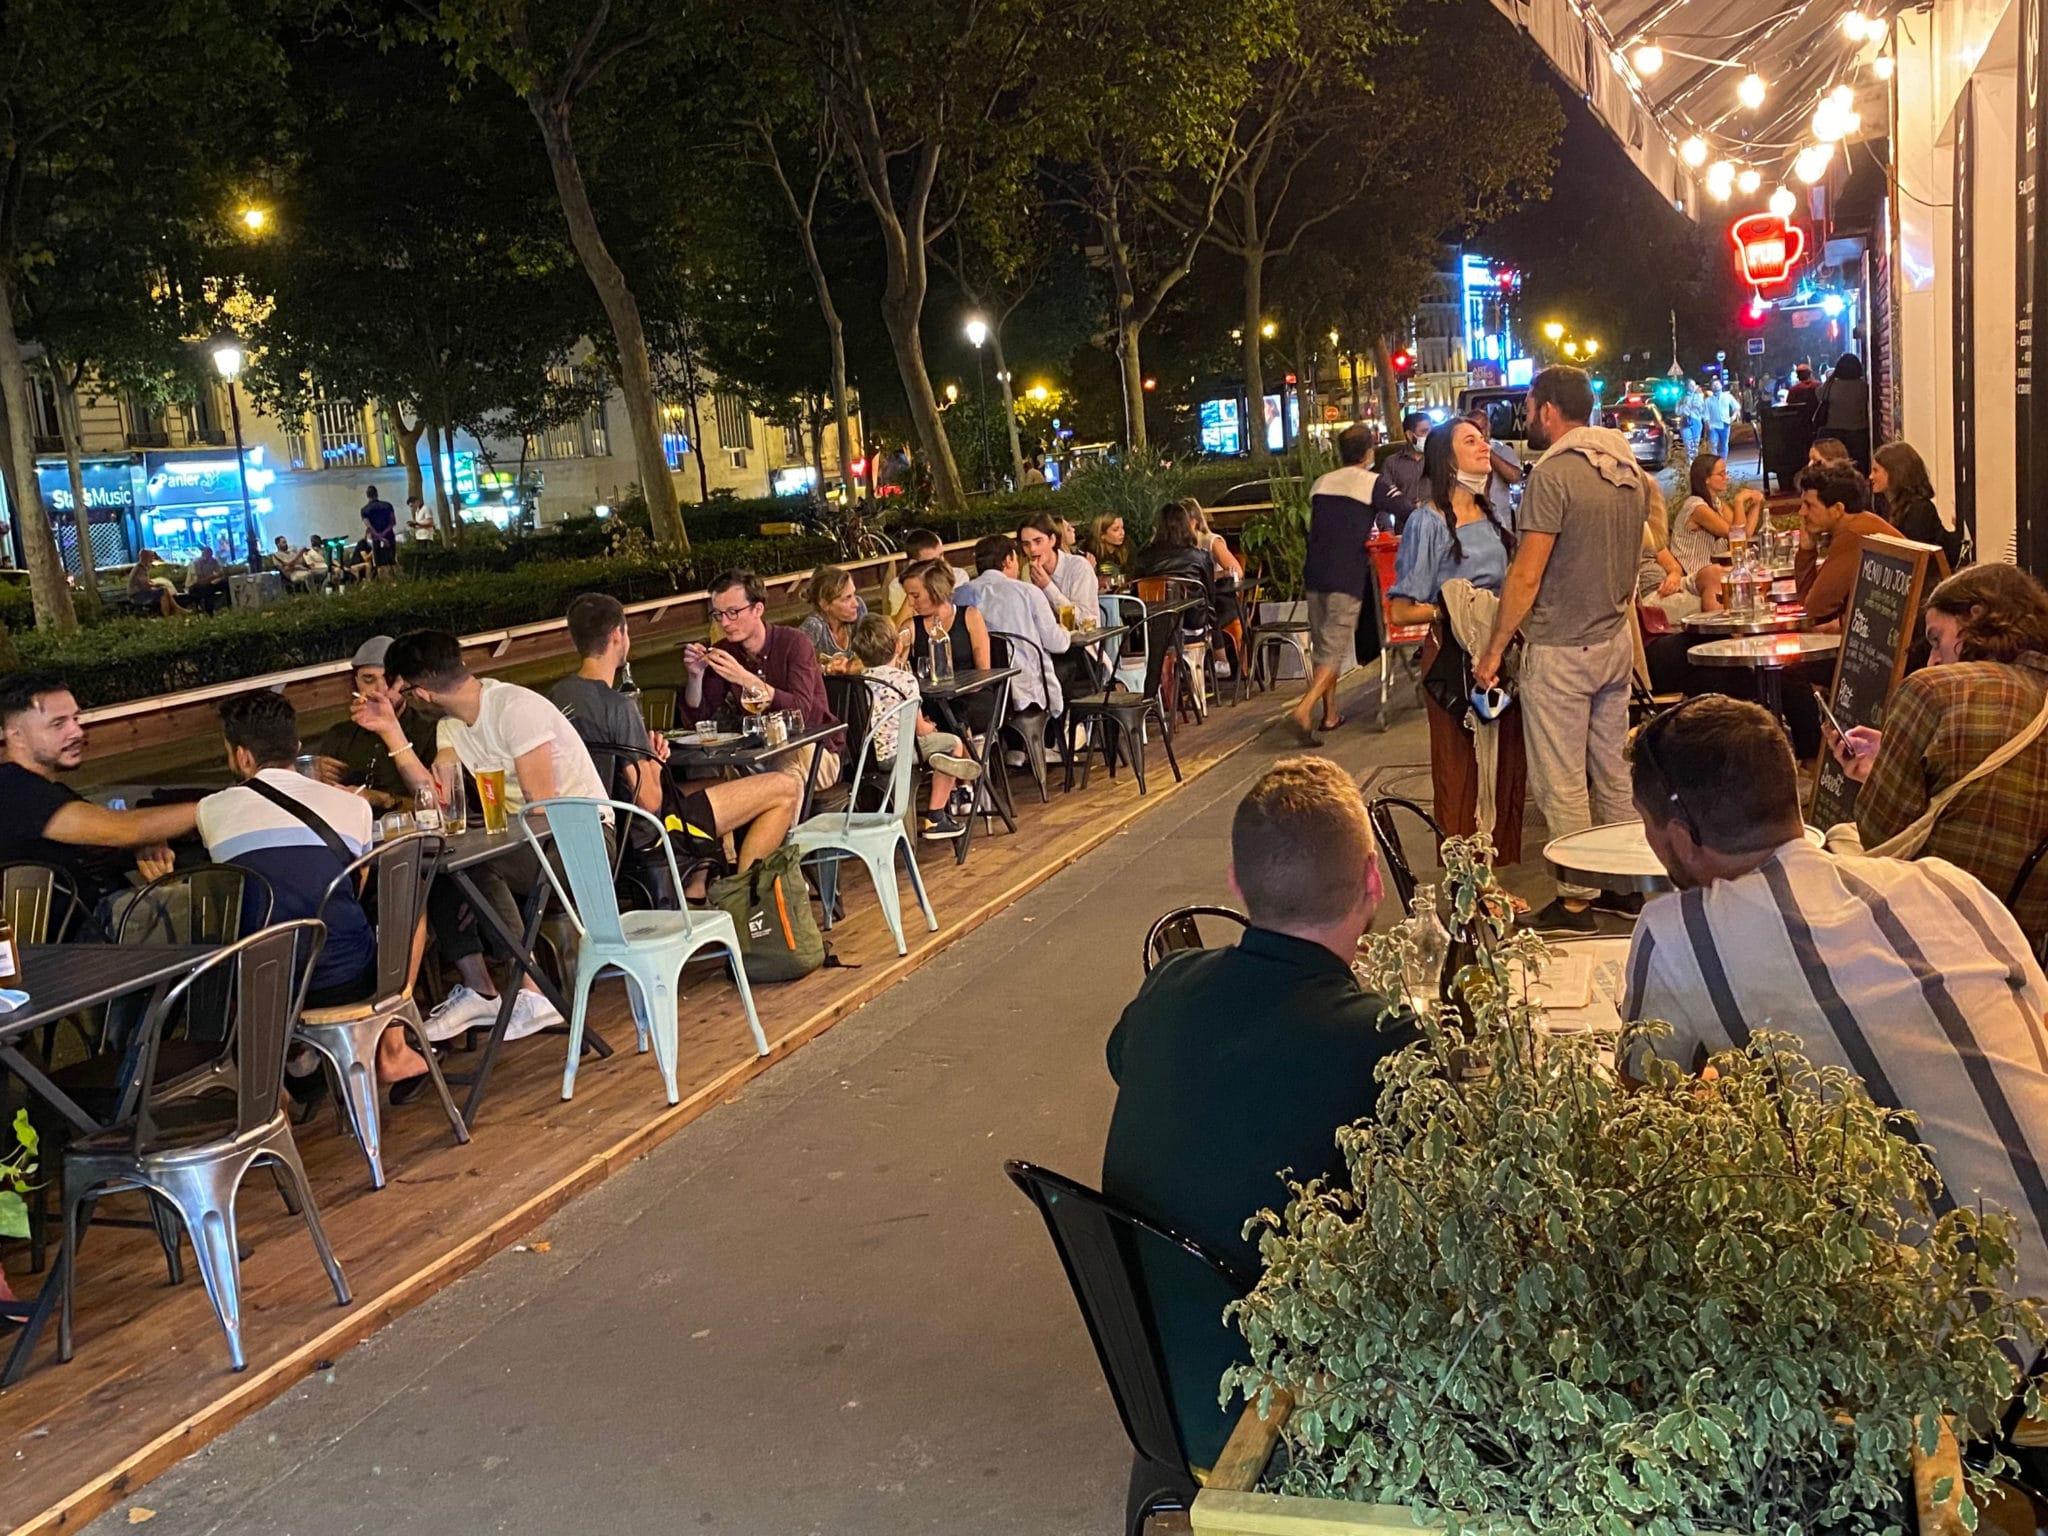 Terrasse restaurant salle d'escalade Vertical'Art Paris Pigalle